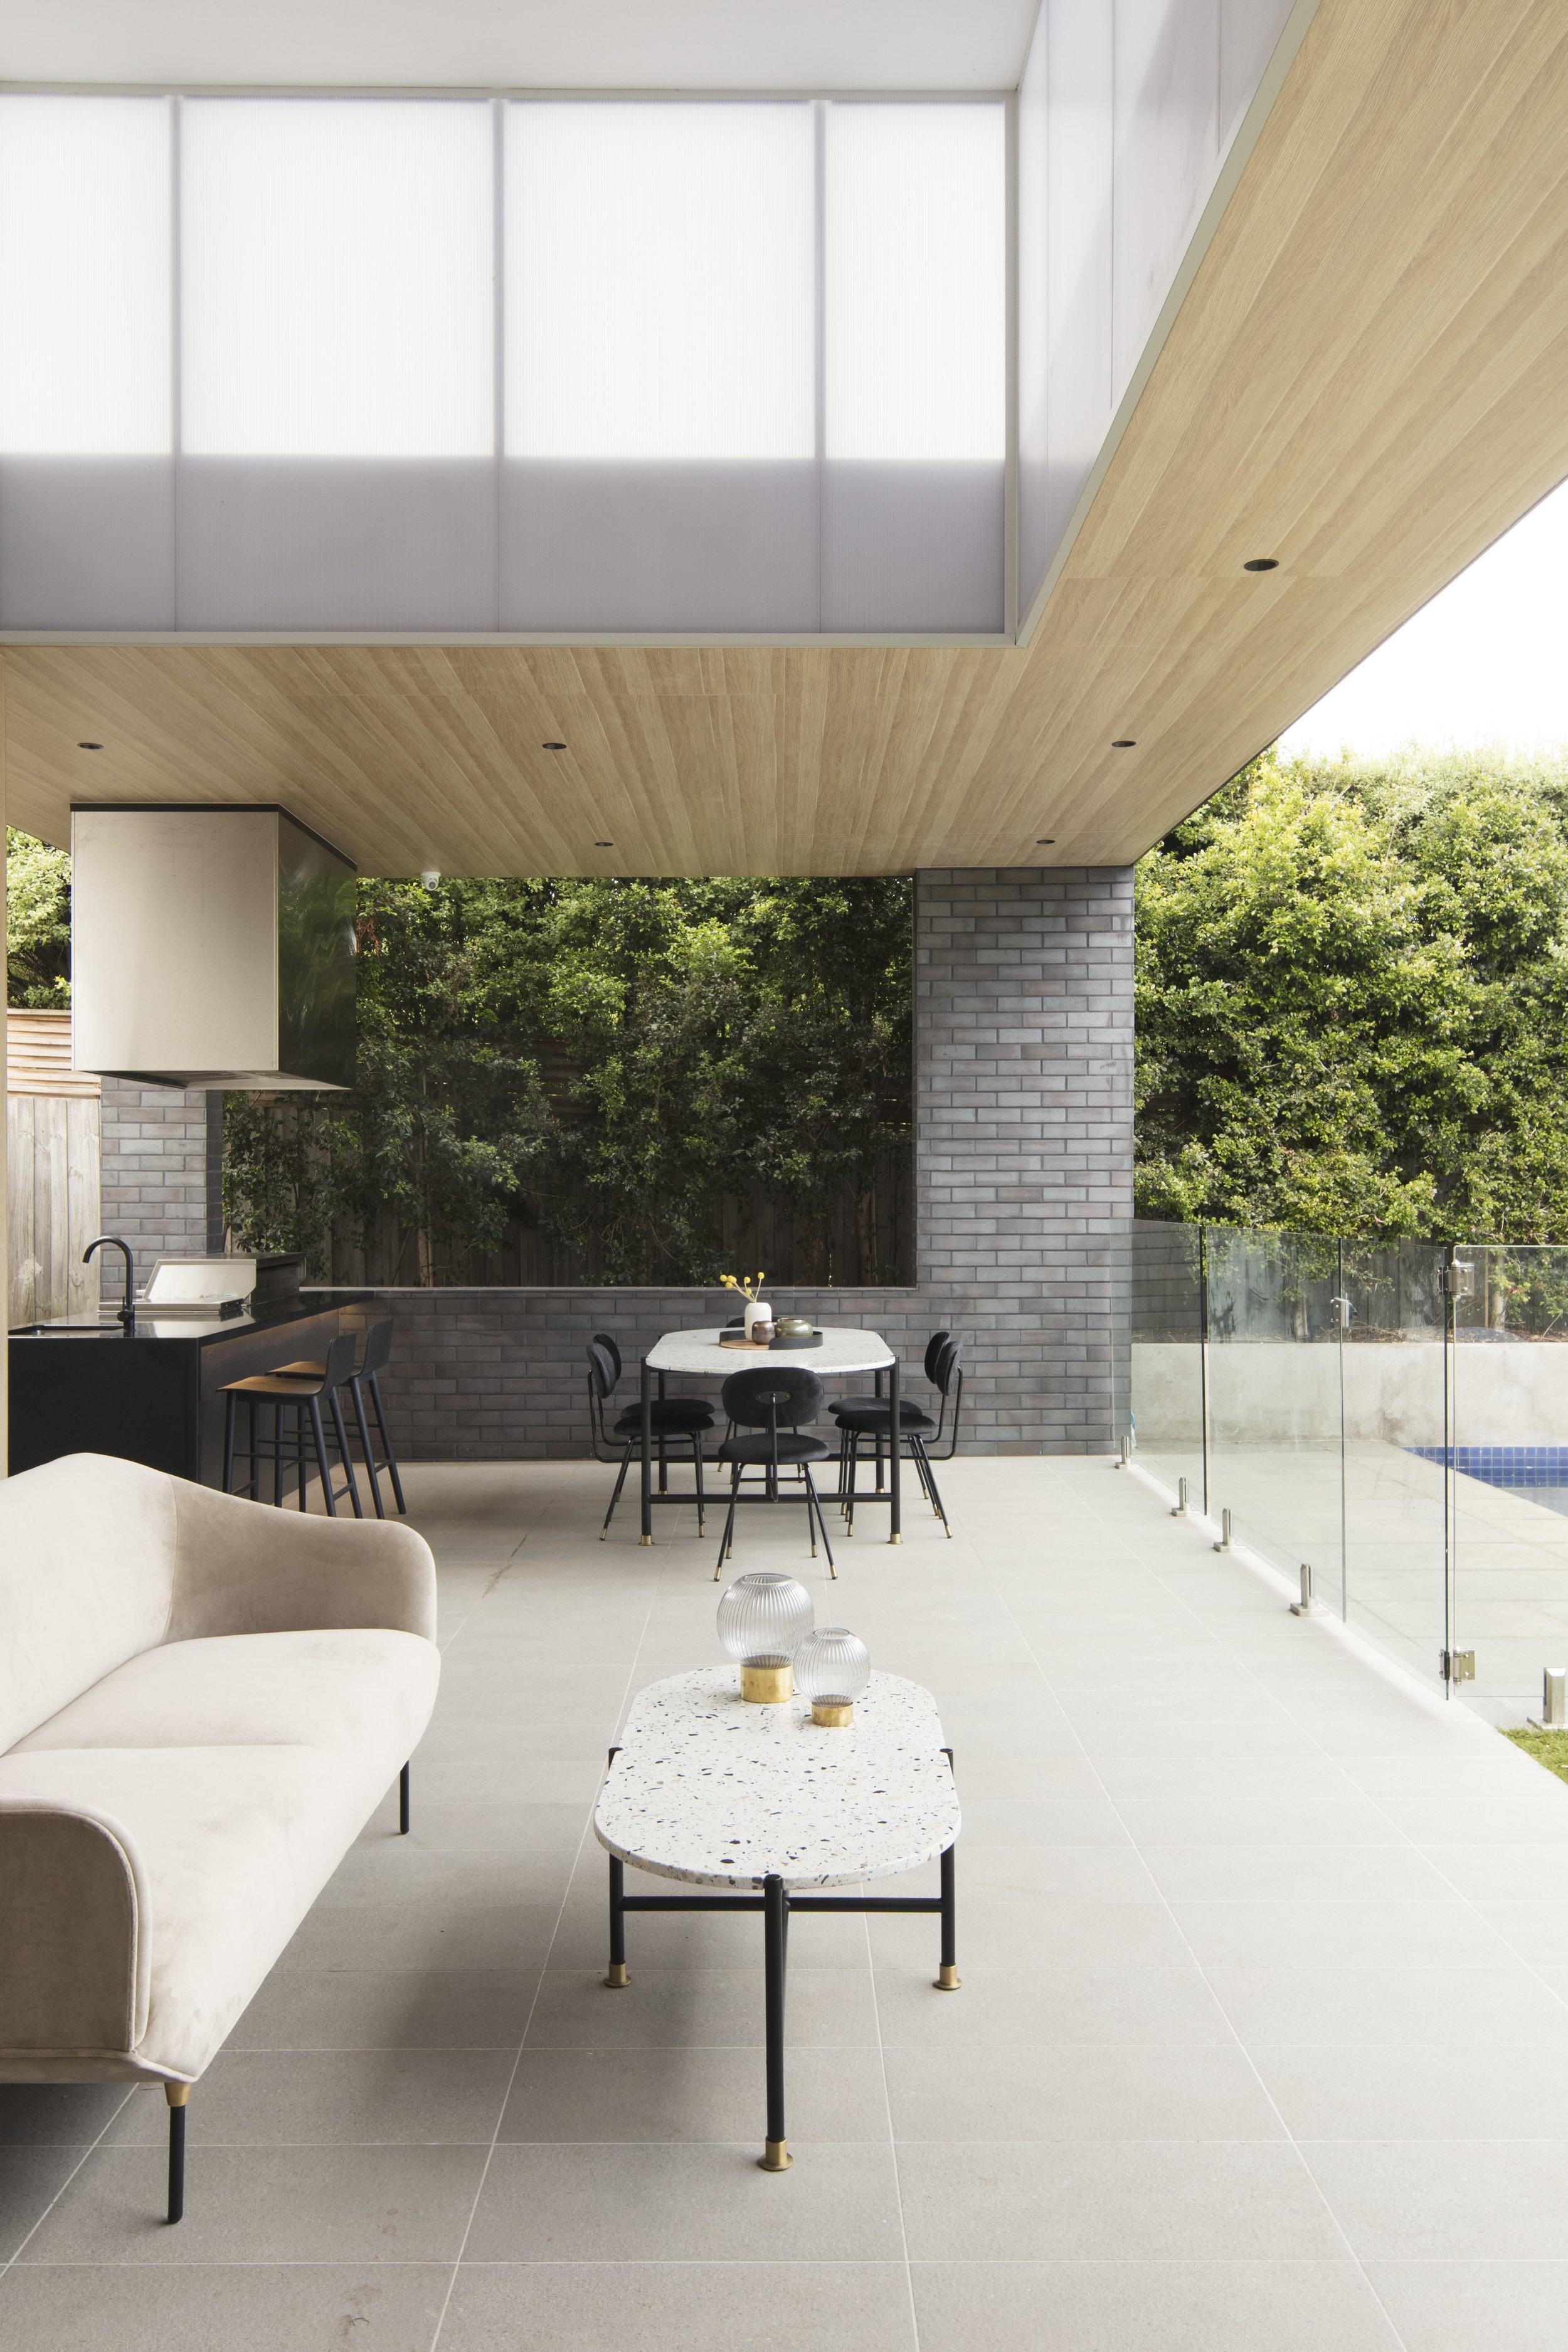 Pitch_Architecture_Lantern House_13